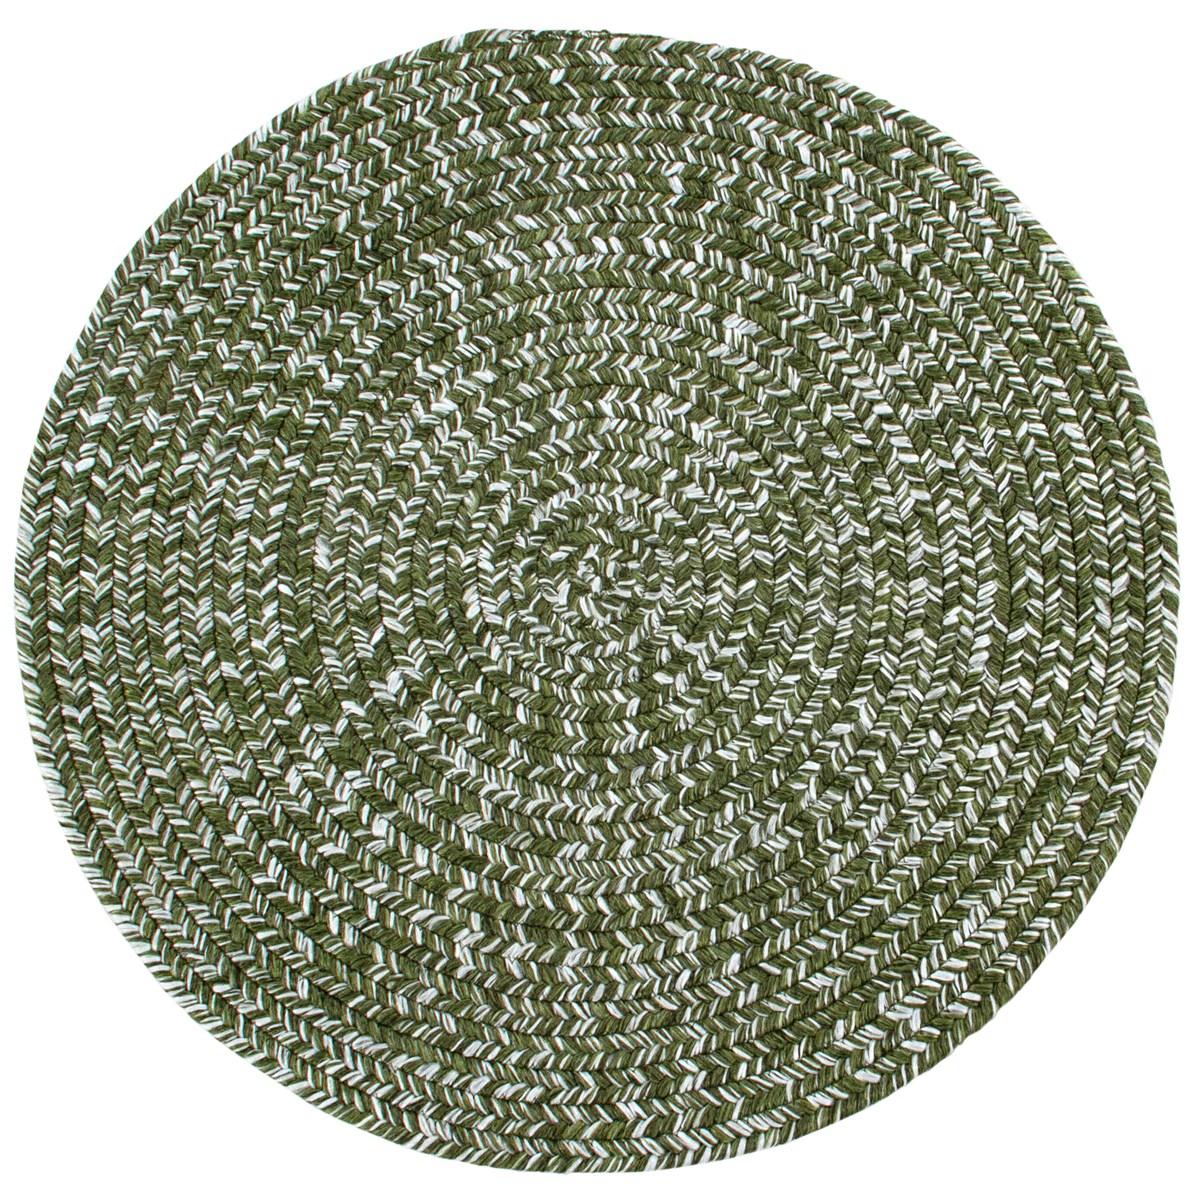 Tapis de salon en Polypropylène Vert olive 160x230 cm